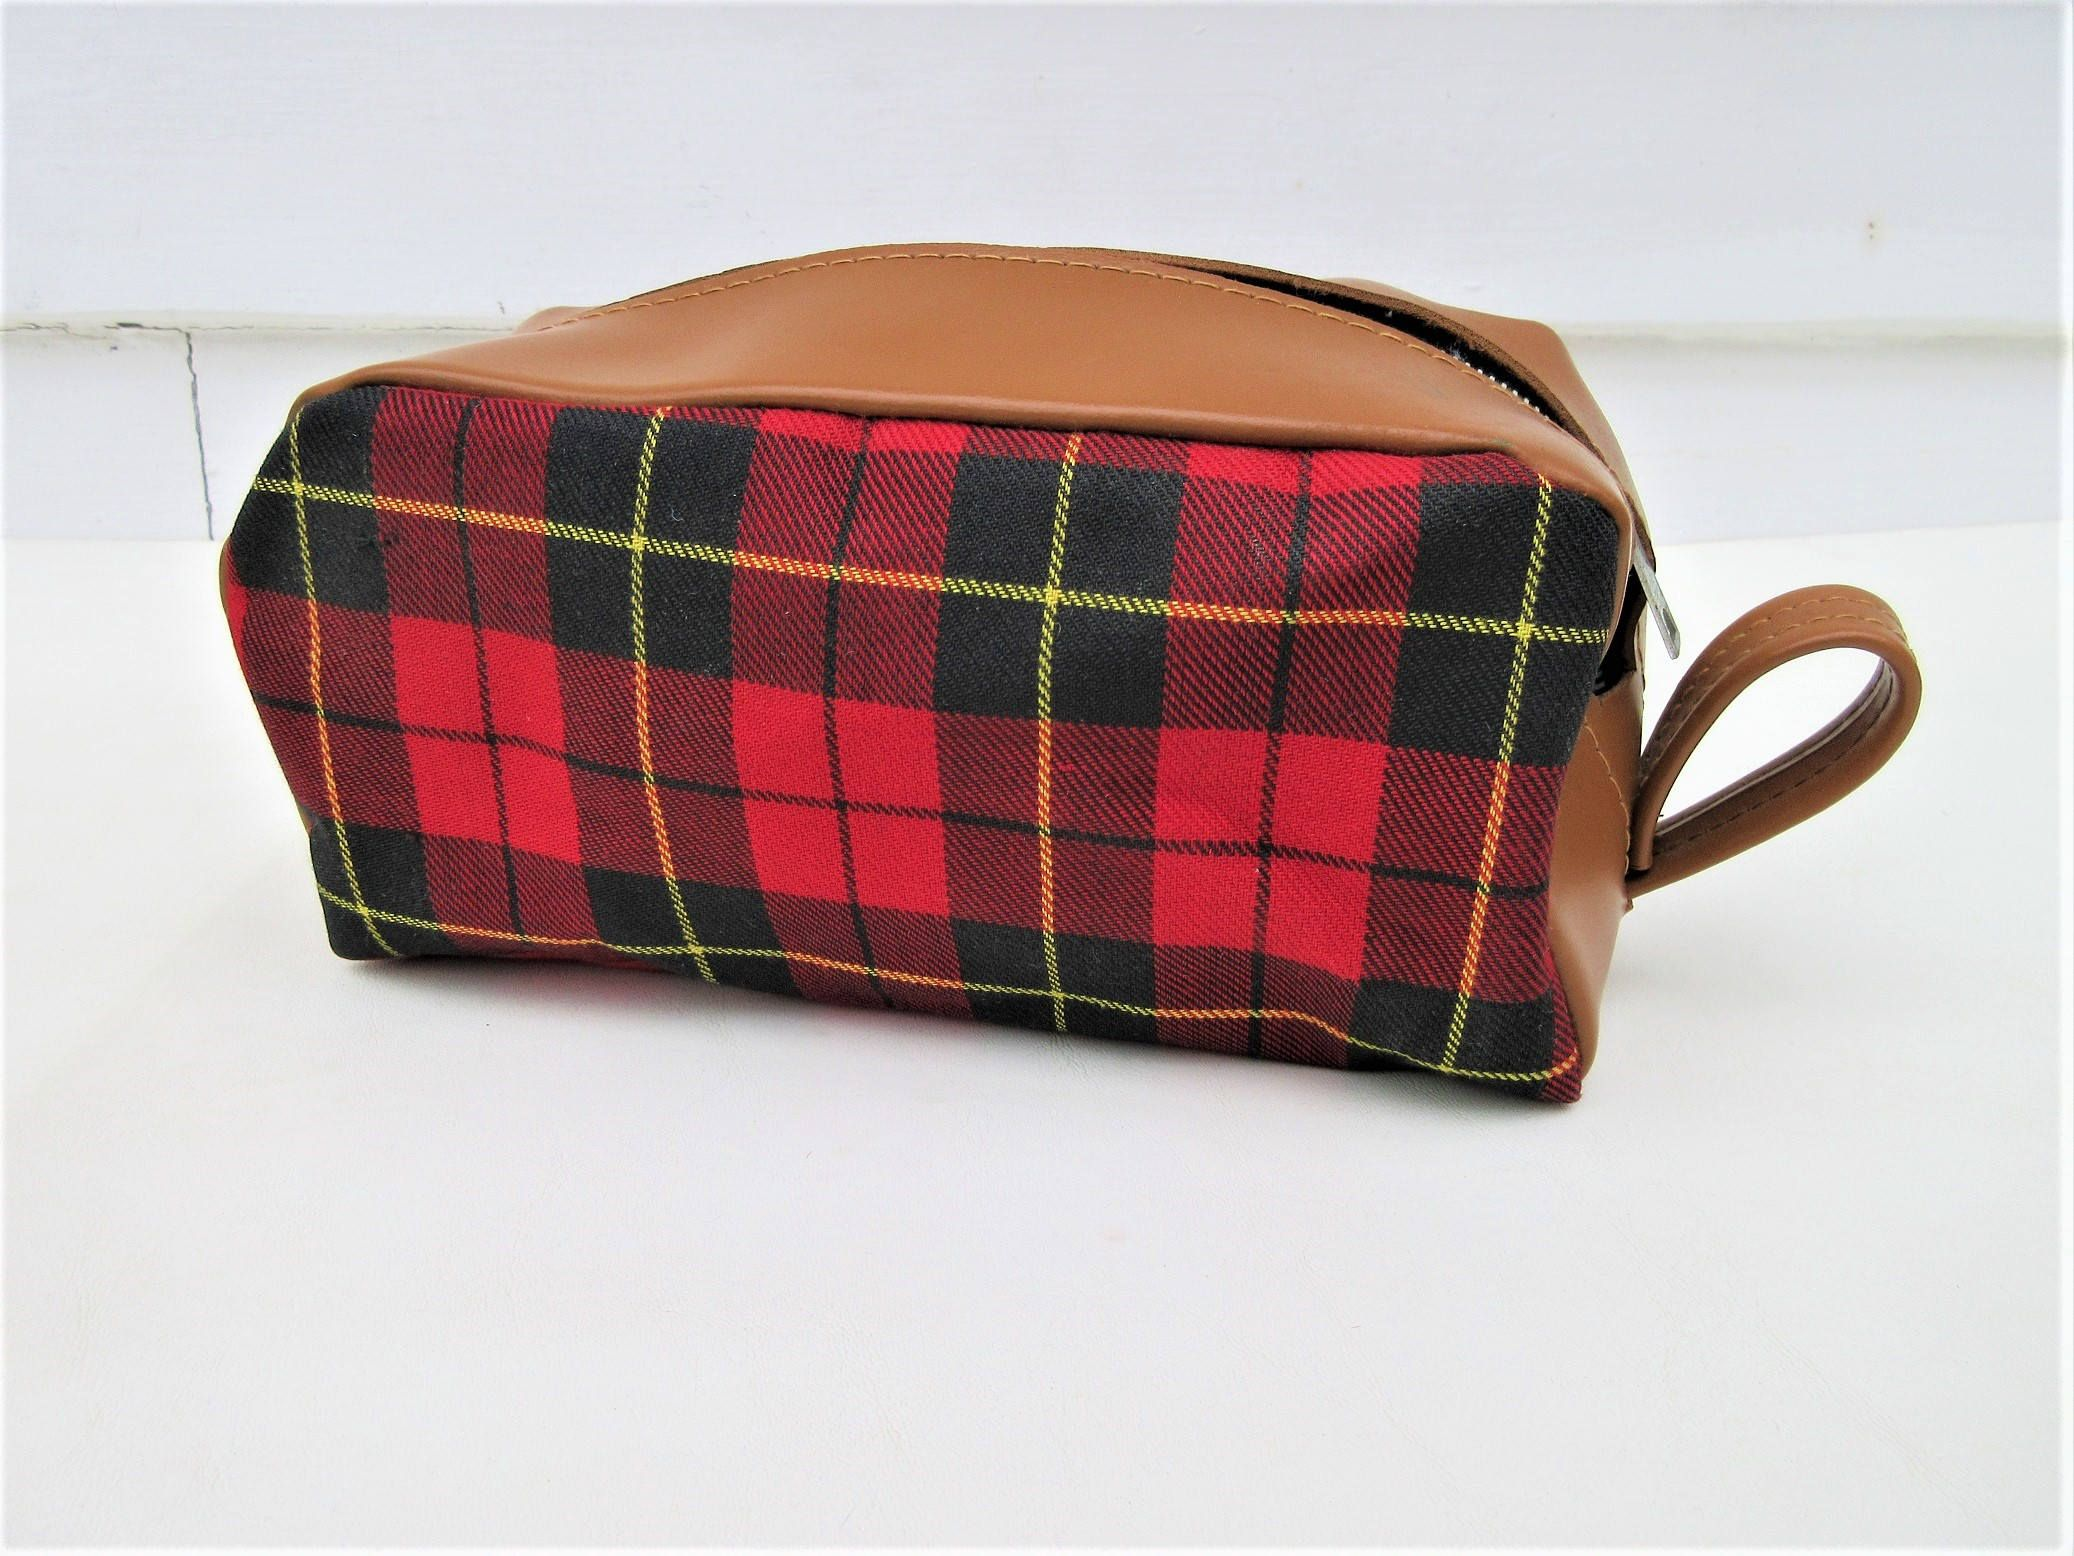 Vintage Plaid Bag Tartan Shaving Kit Dopp Kit Small